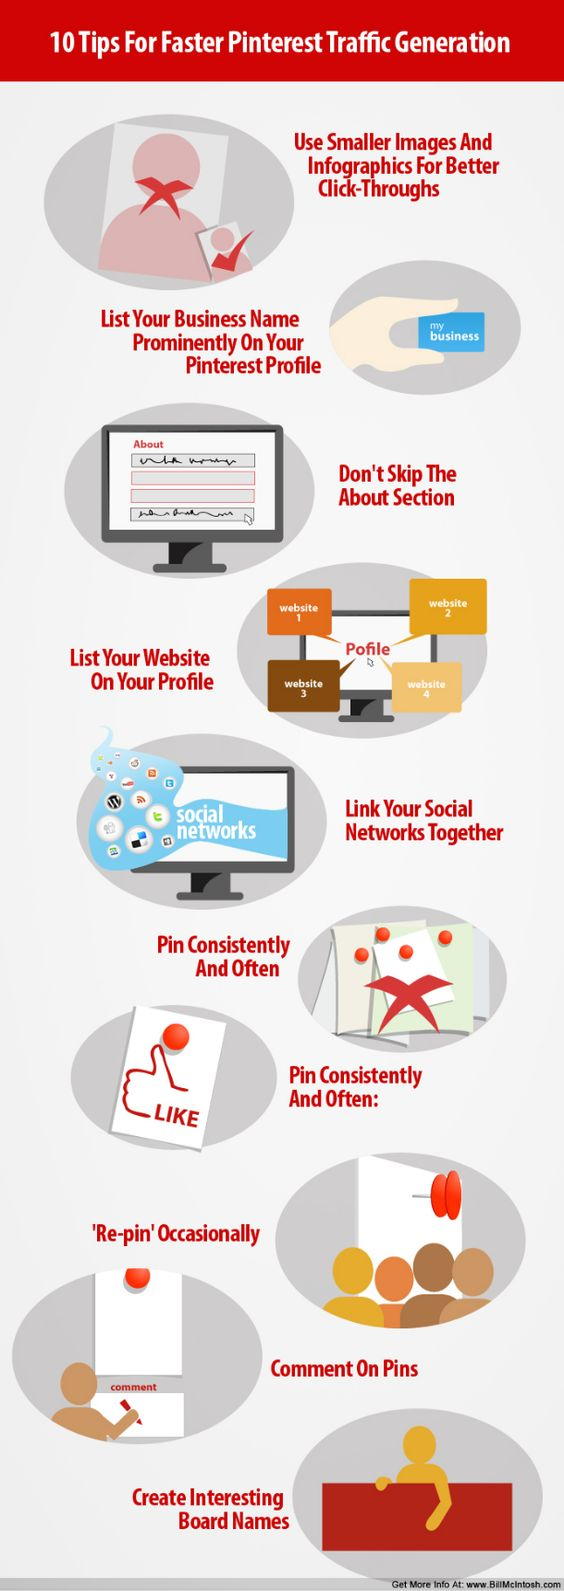 10 Tips for Faster Pinterest Traffic Generation